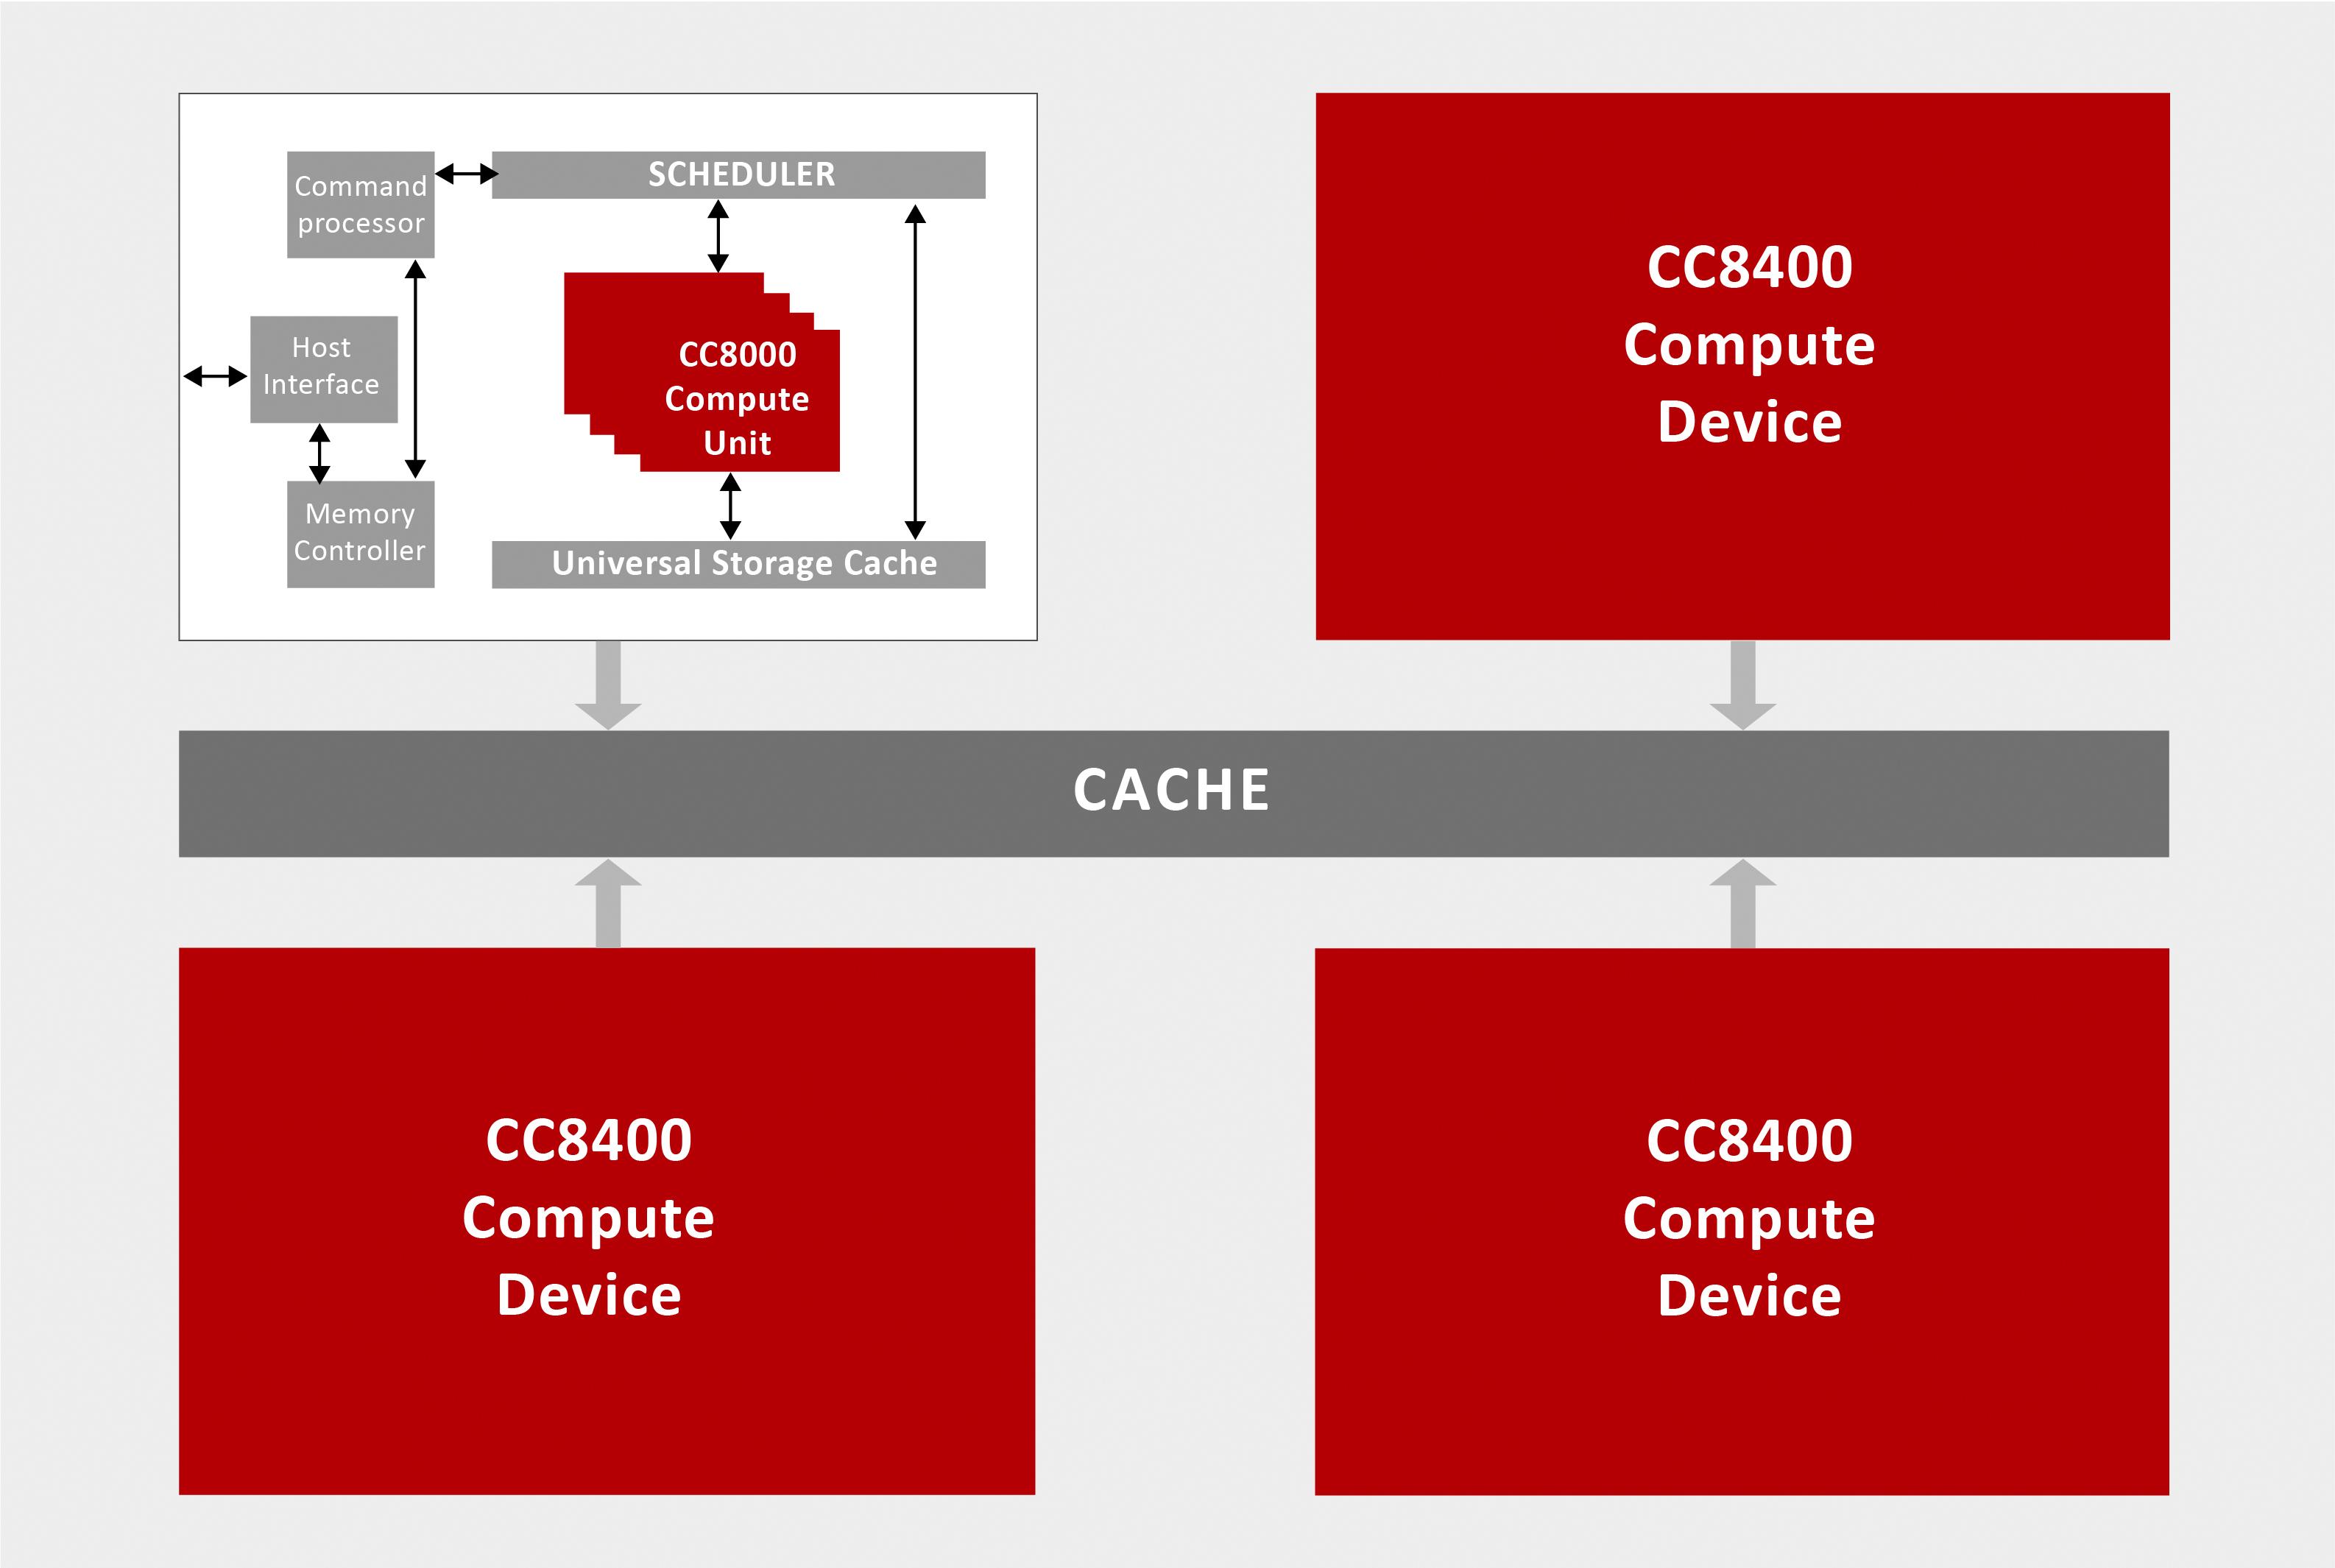 Architecture of CC8400 (Graphic: Business Wire)